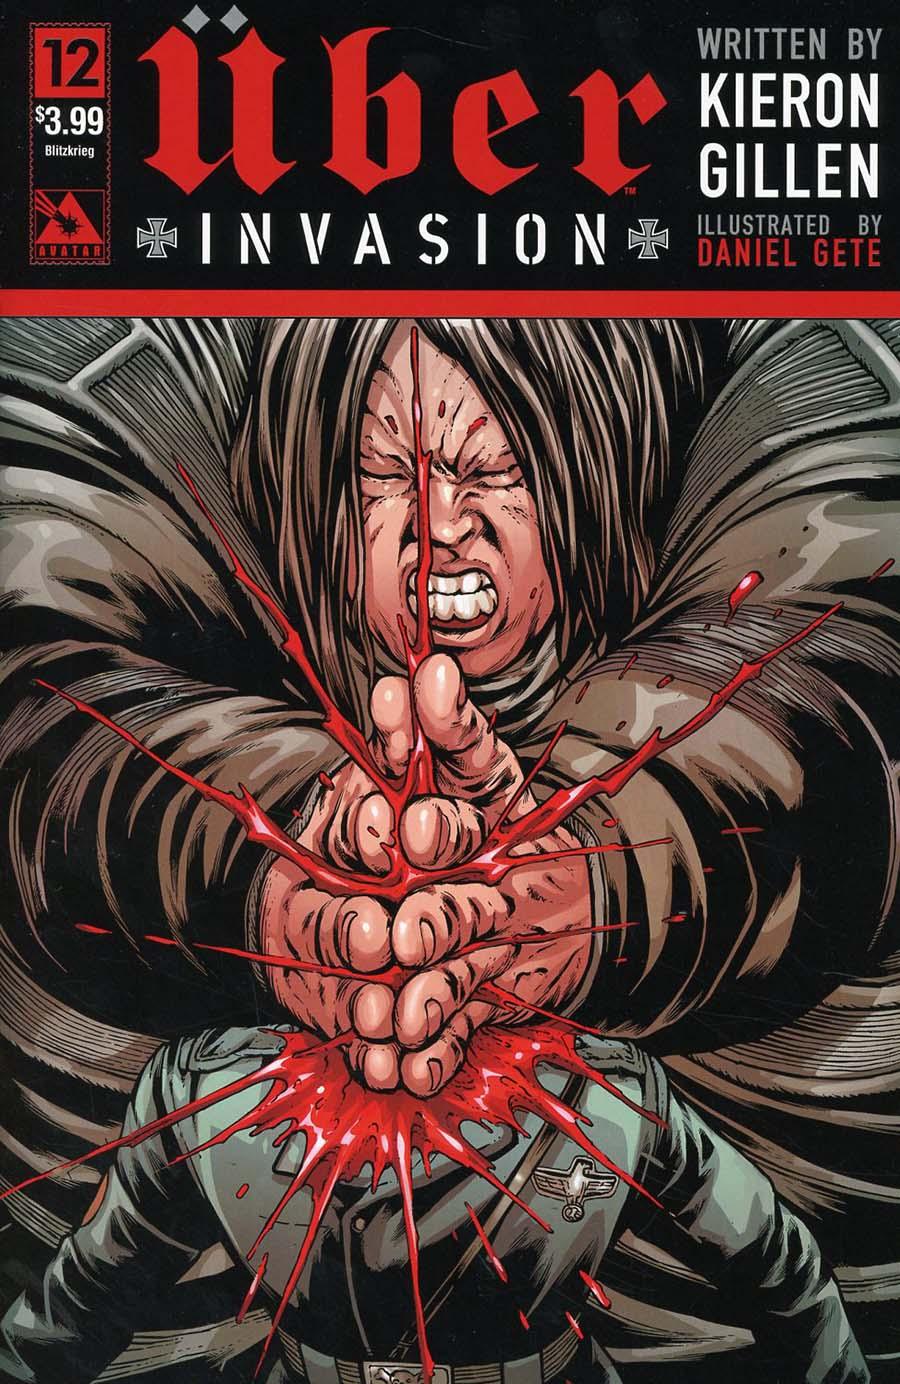 Uber Invasion #12 Cover D Blitzkrieg Cover